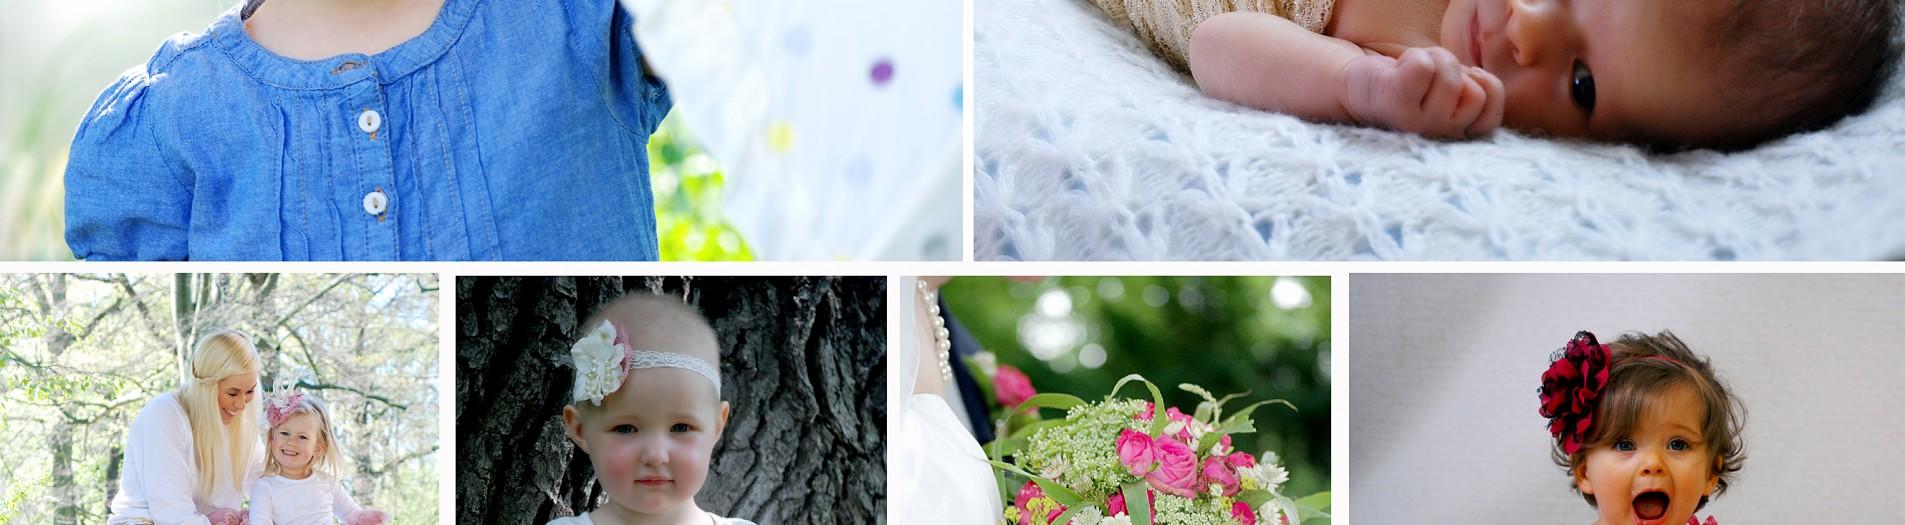 Jahresrückblick 2014 - Mai bis Juli